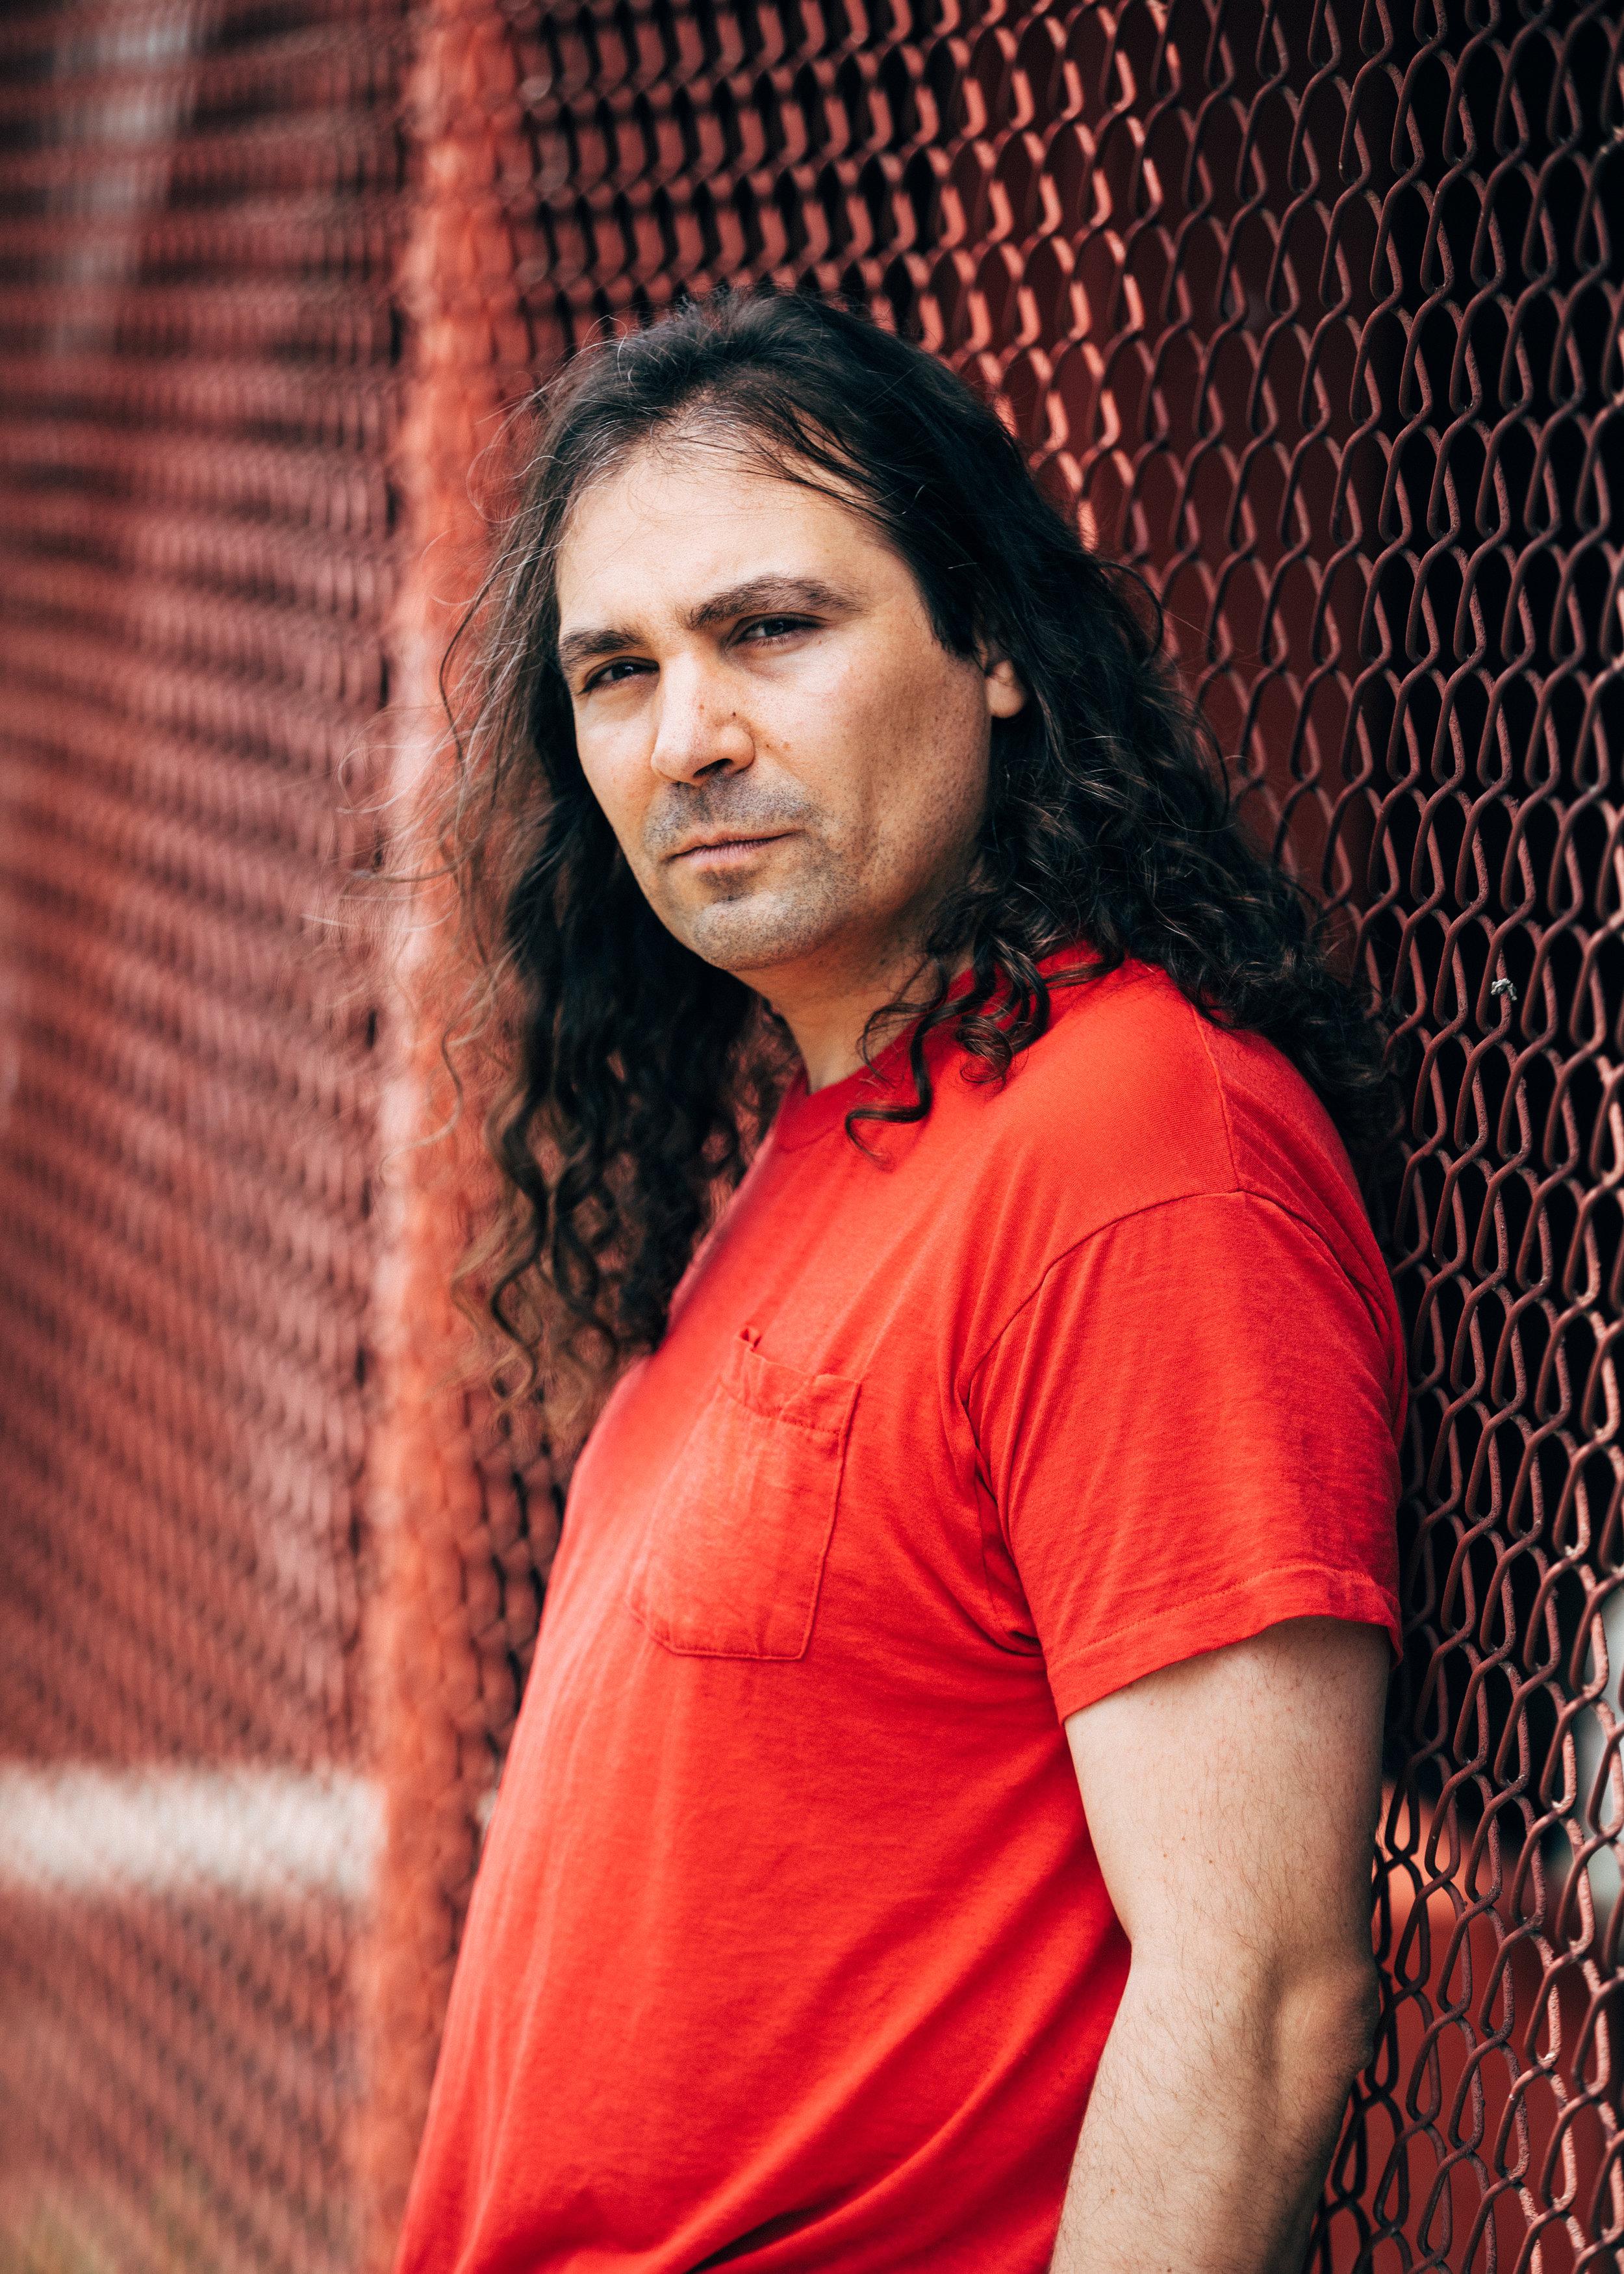 Adam Granduciel of The War on Drugs for Malibu Magazine